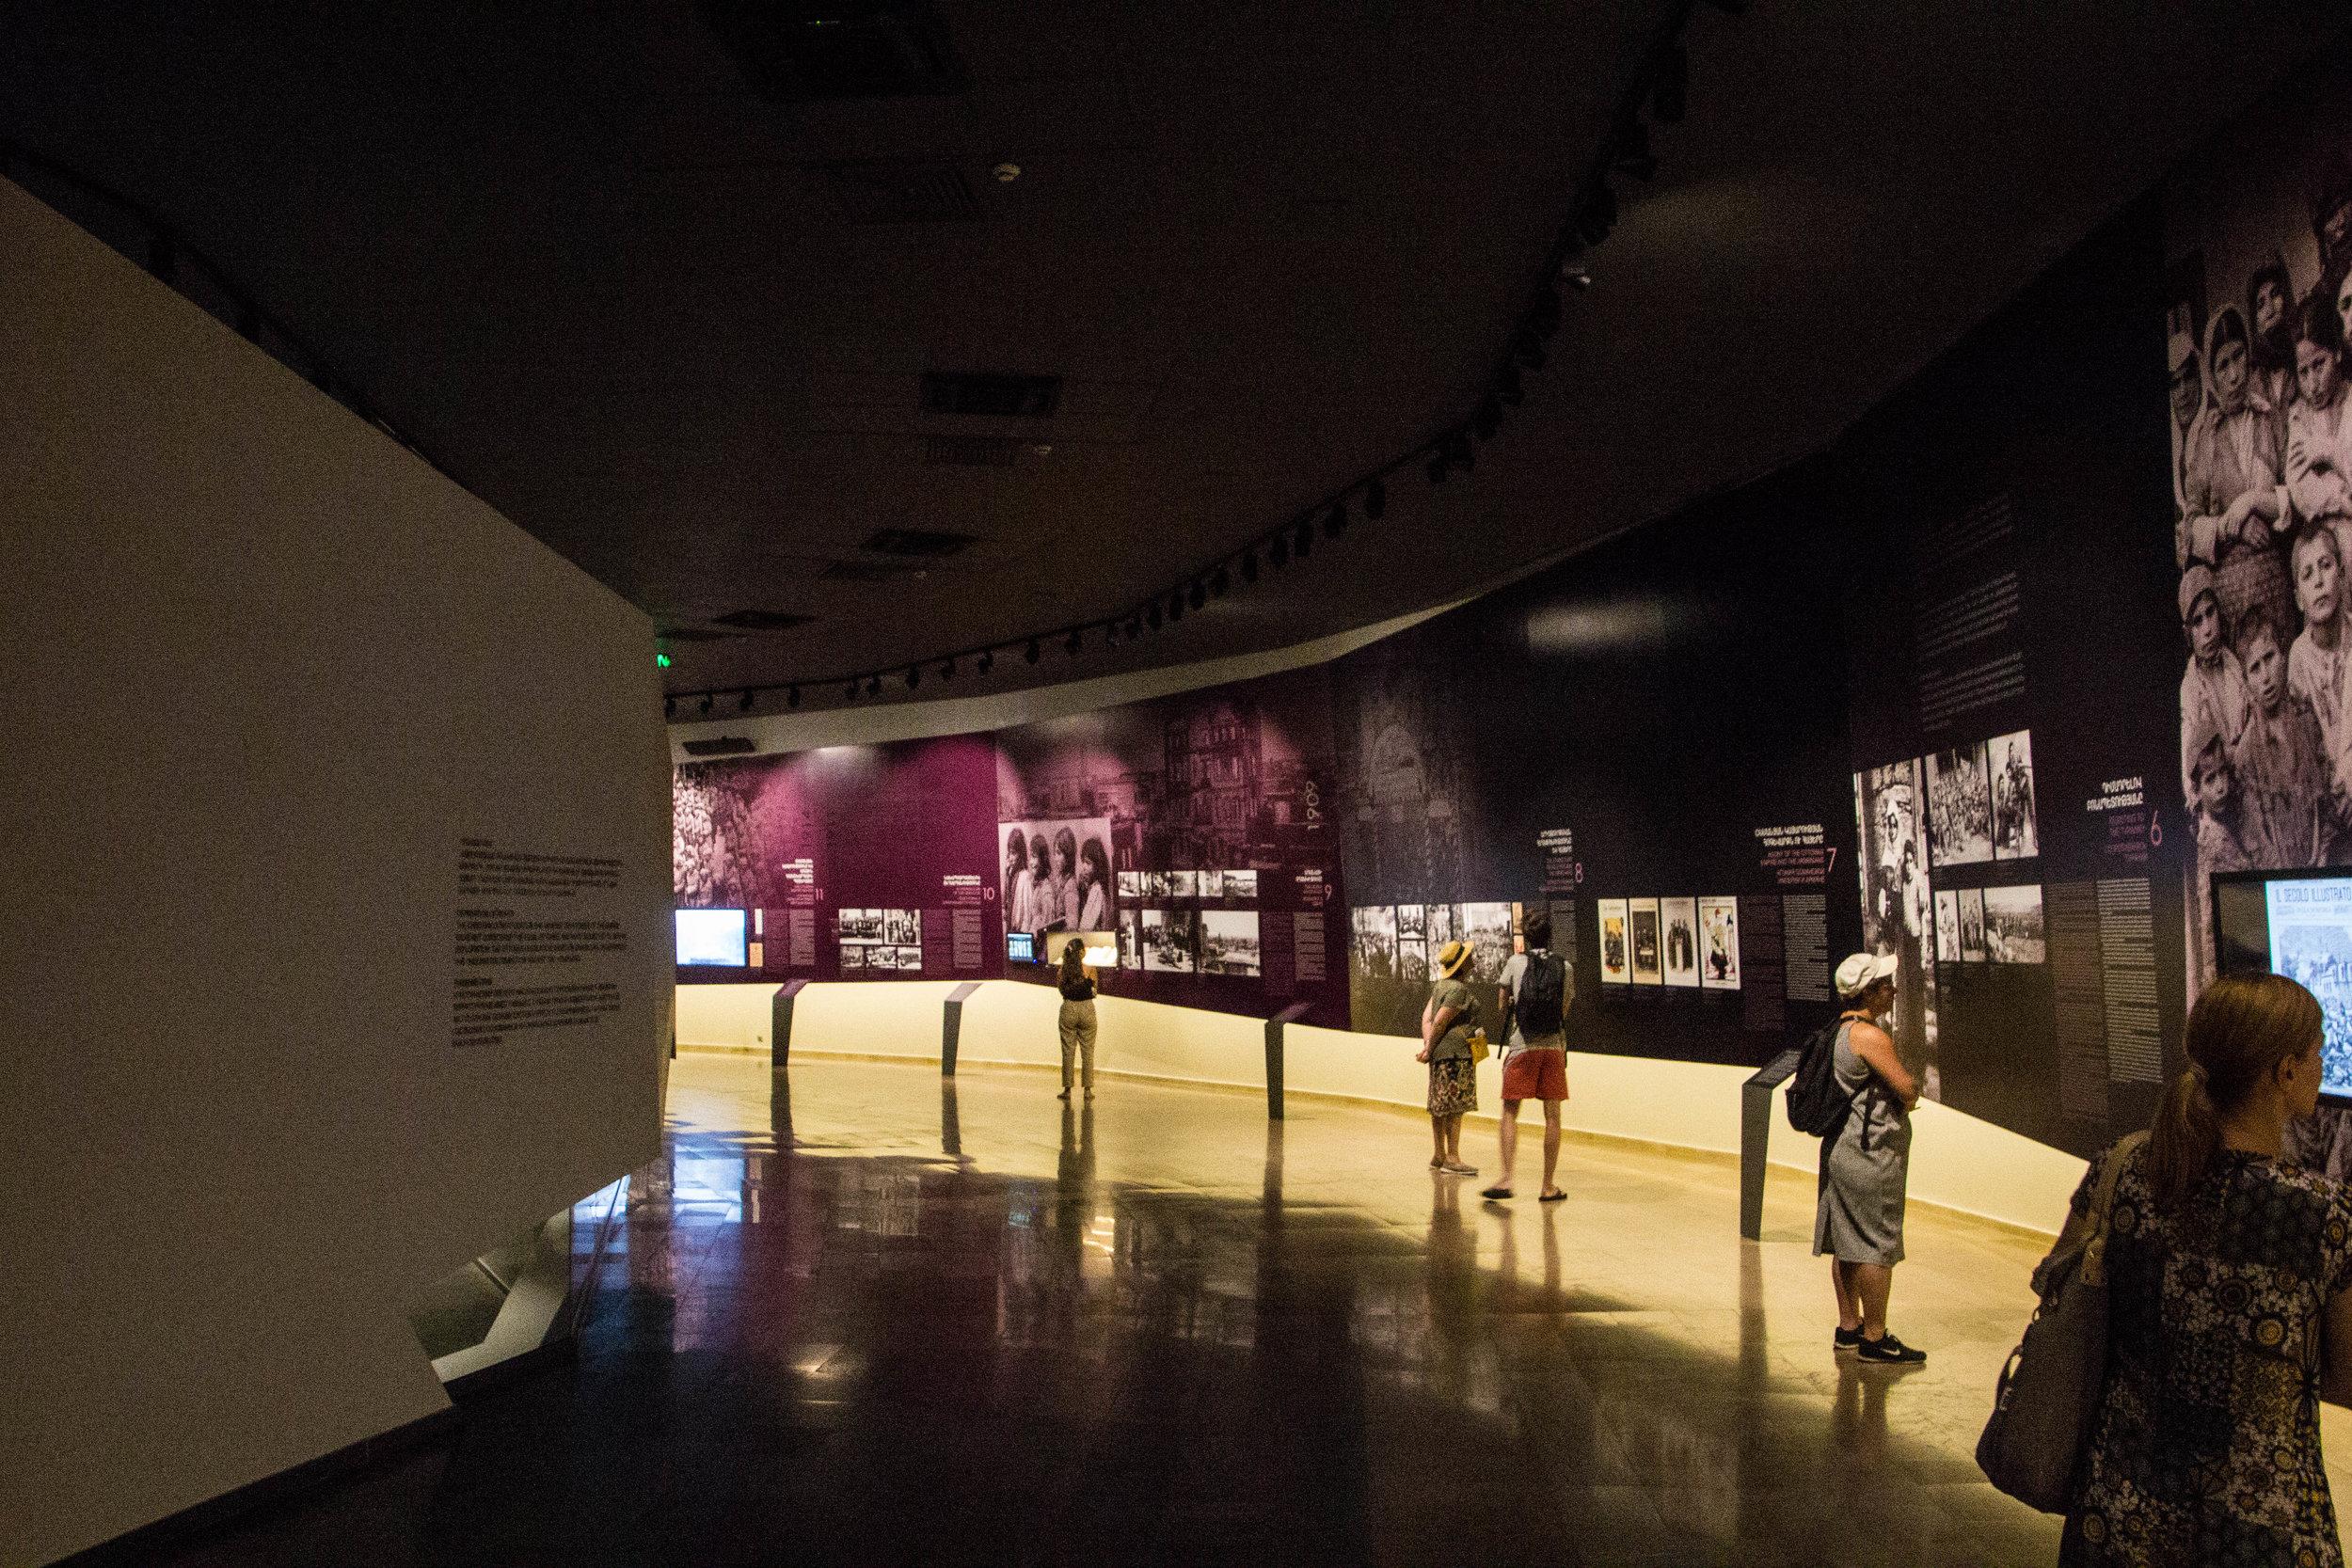 tsitsernakaberd-armenian-genocide-memorial-6.jpg